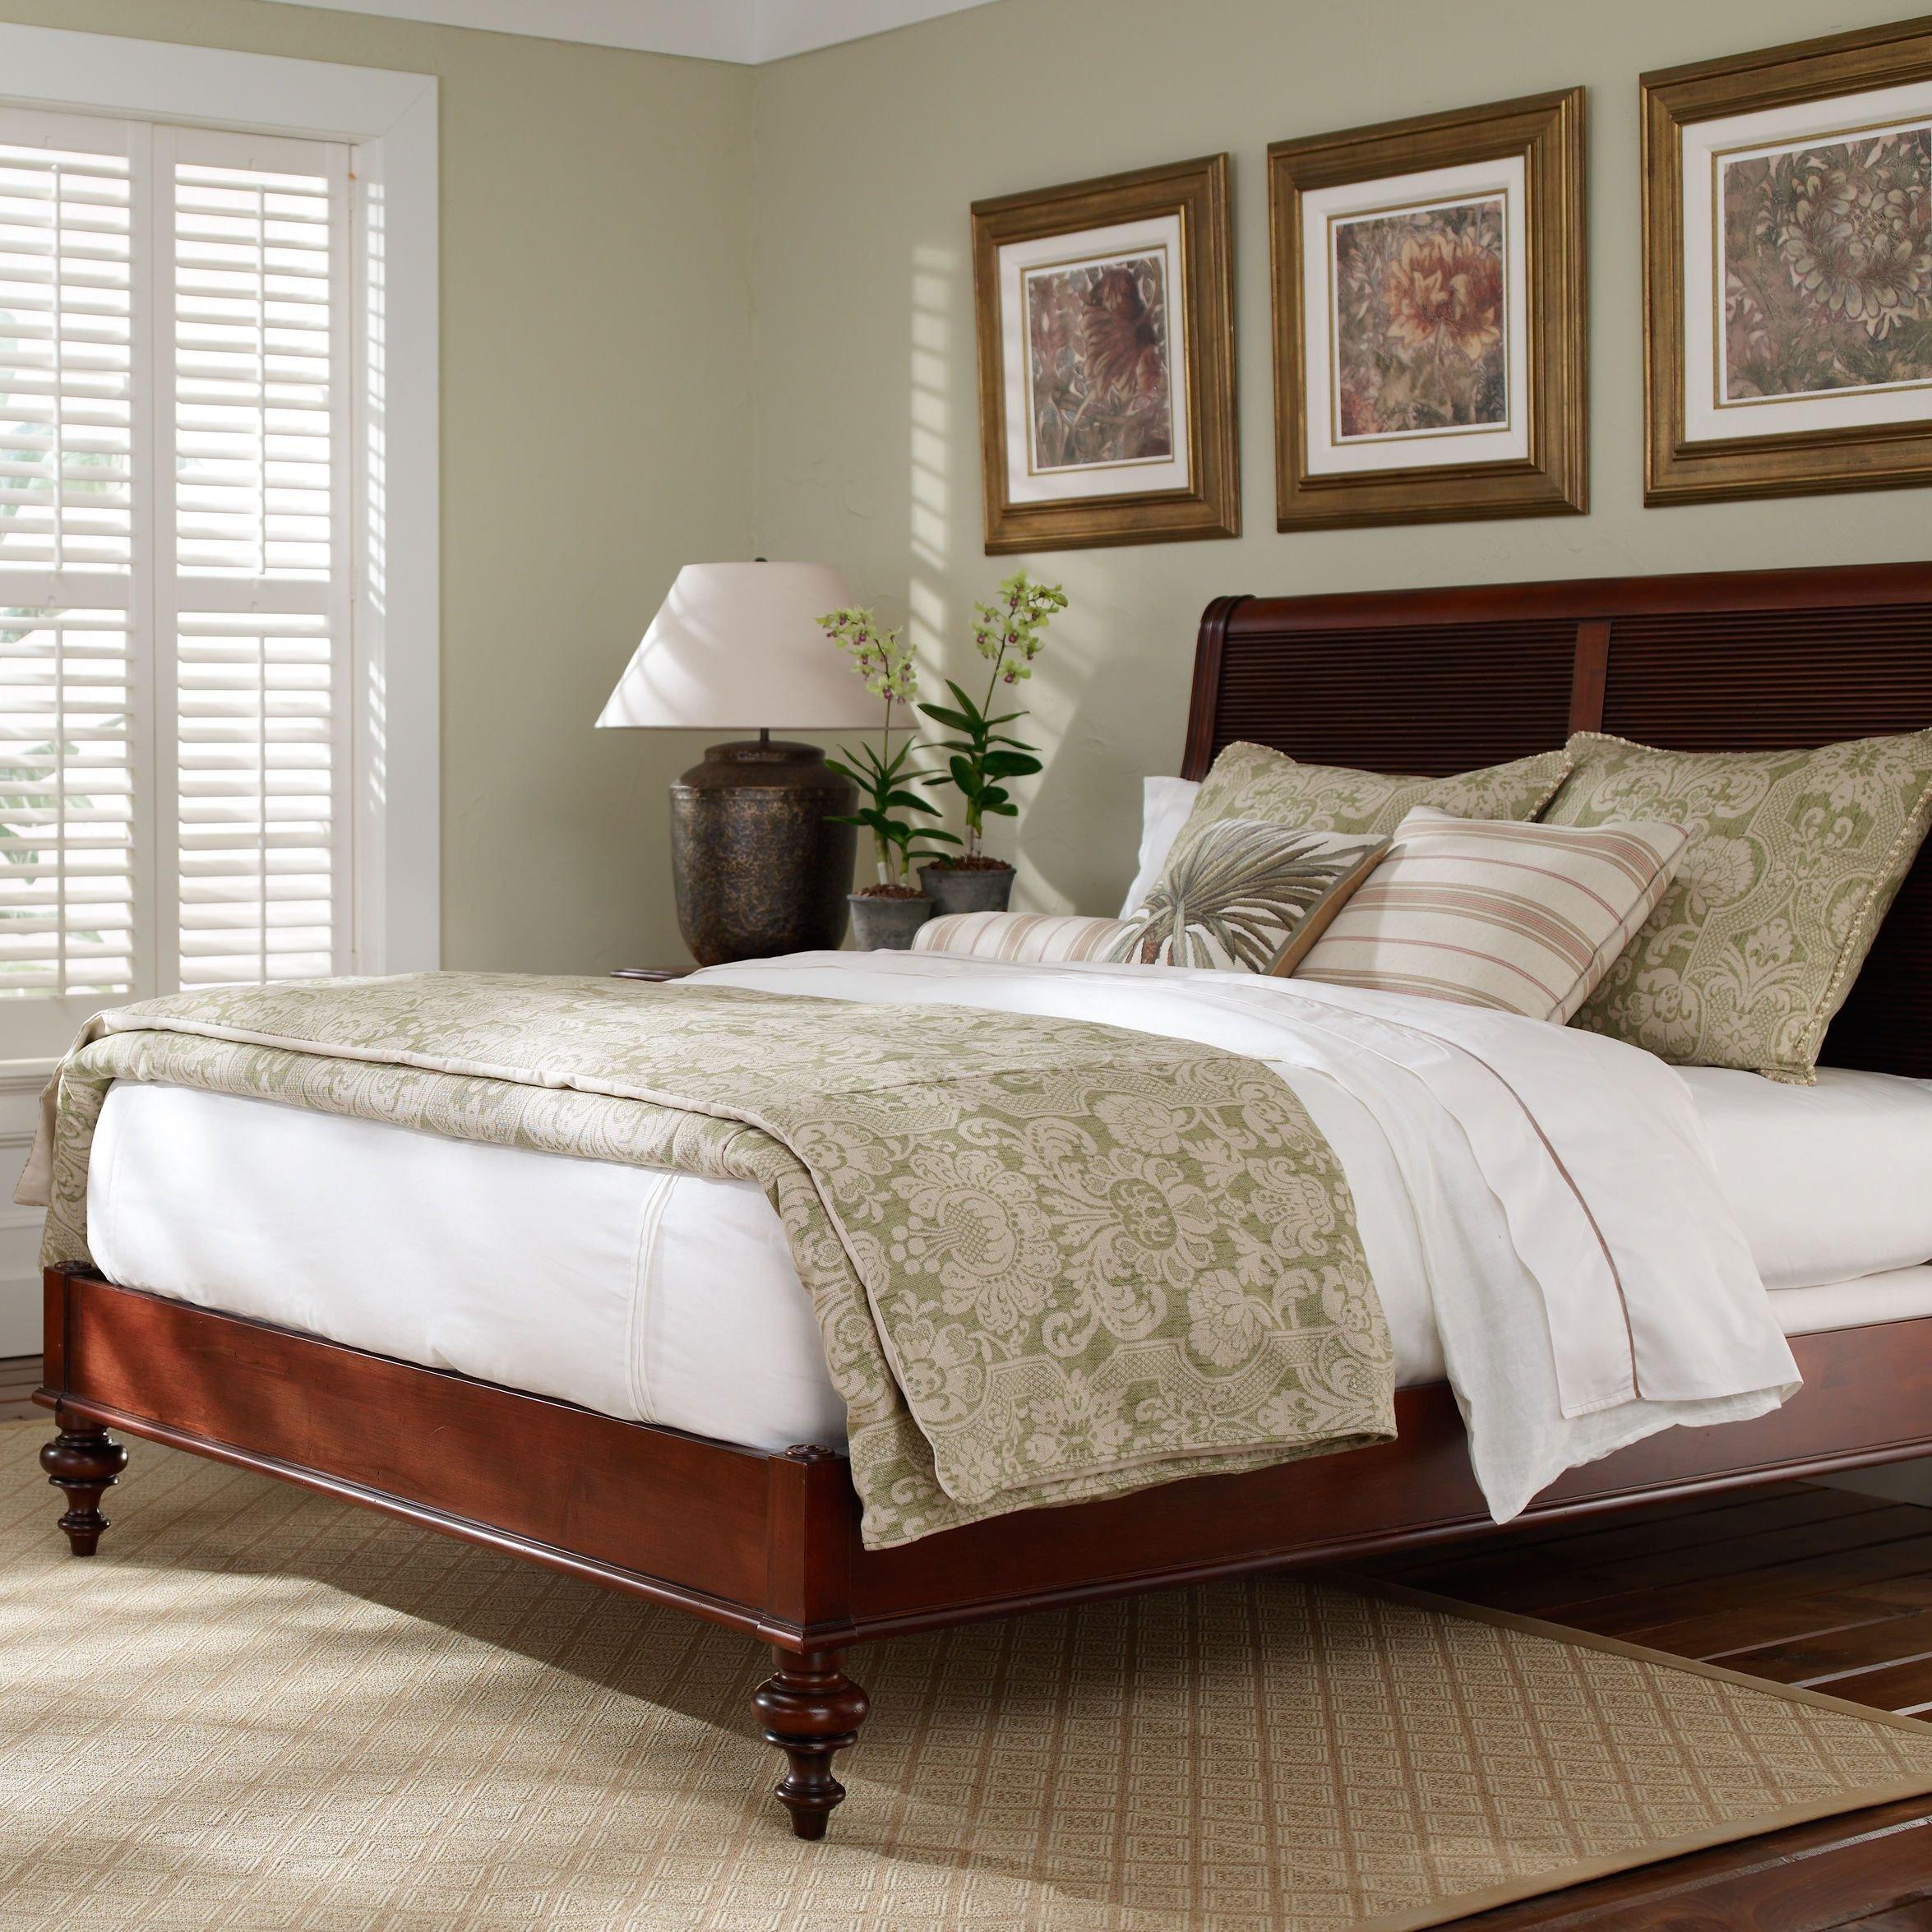 Tommy Bahama Bedroom Set New Cayman Bed Ethan Allen Us